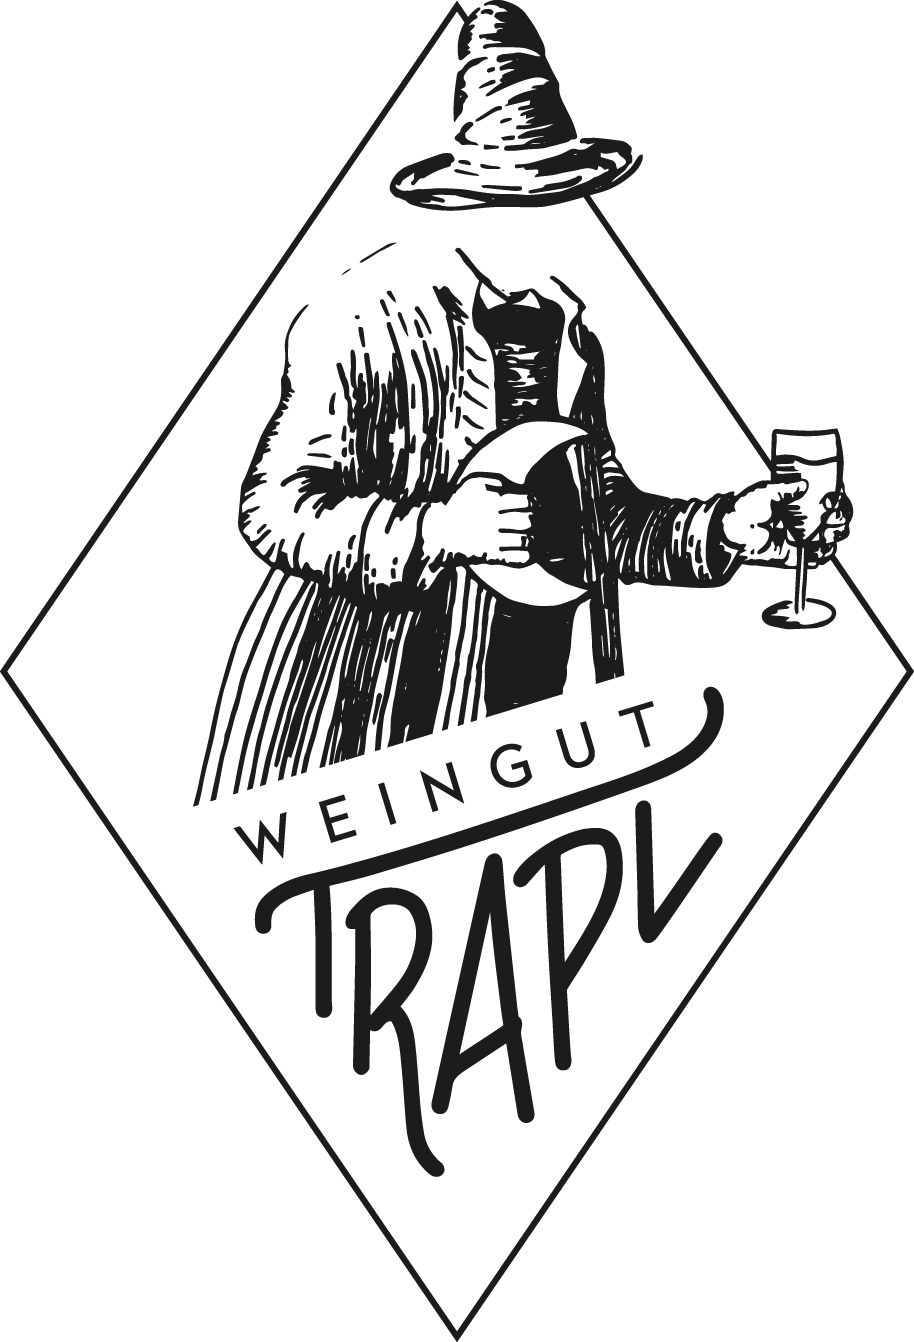 LOGO-Weingut-Trapl-RZNEU